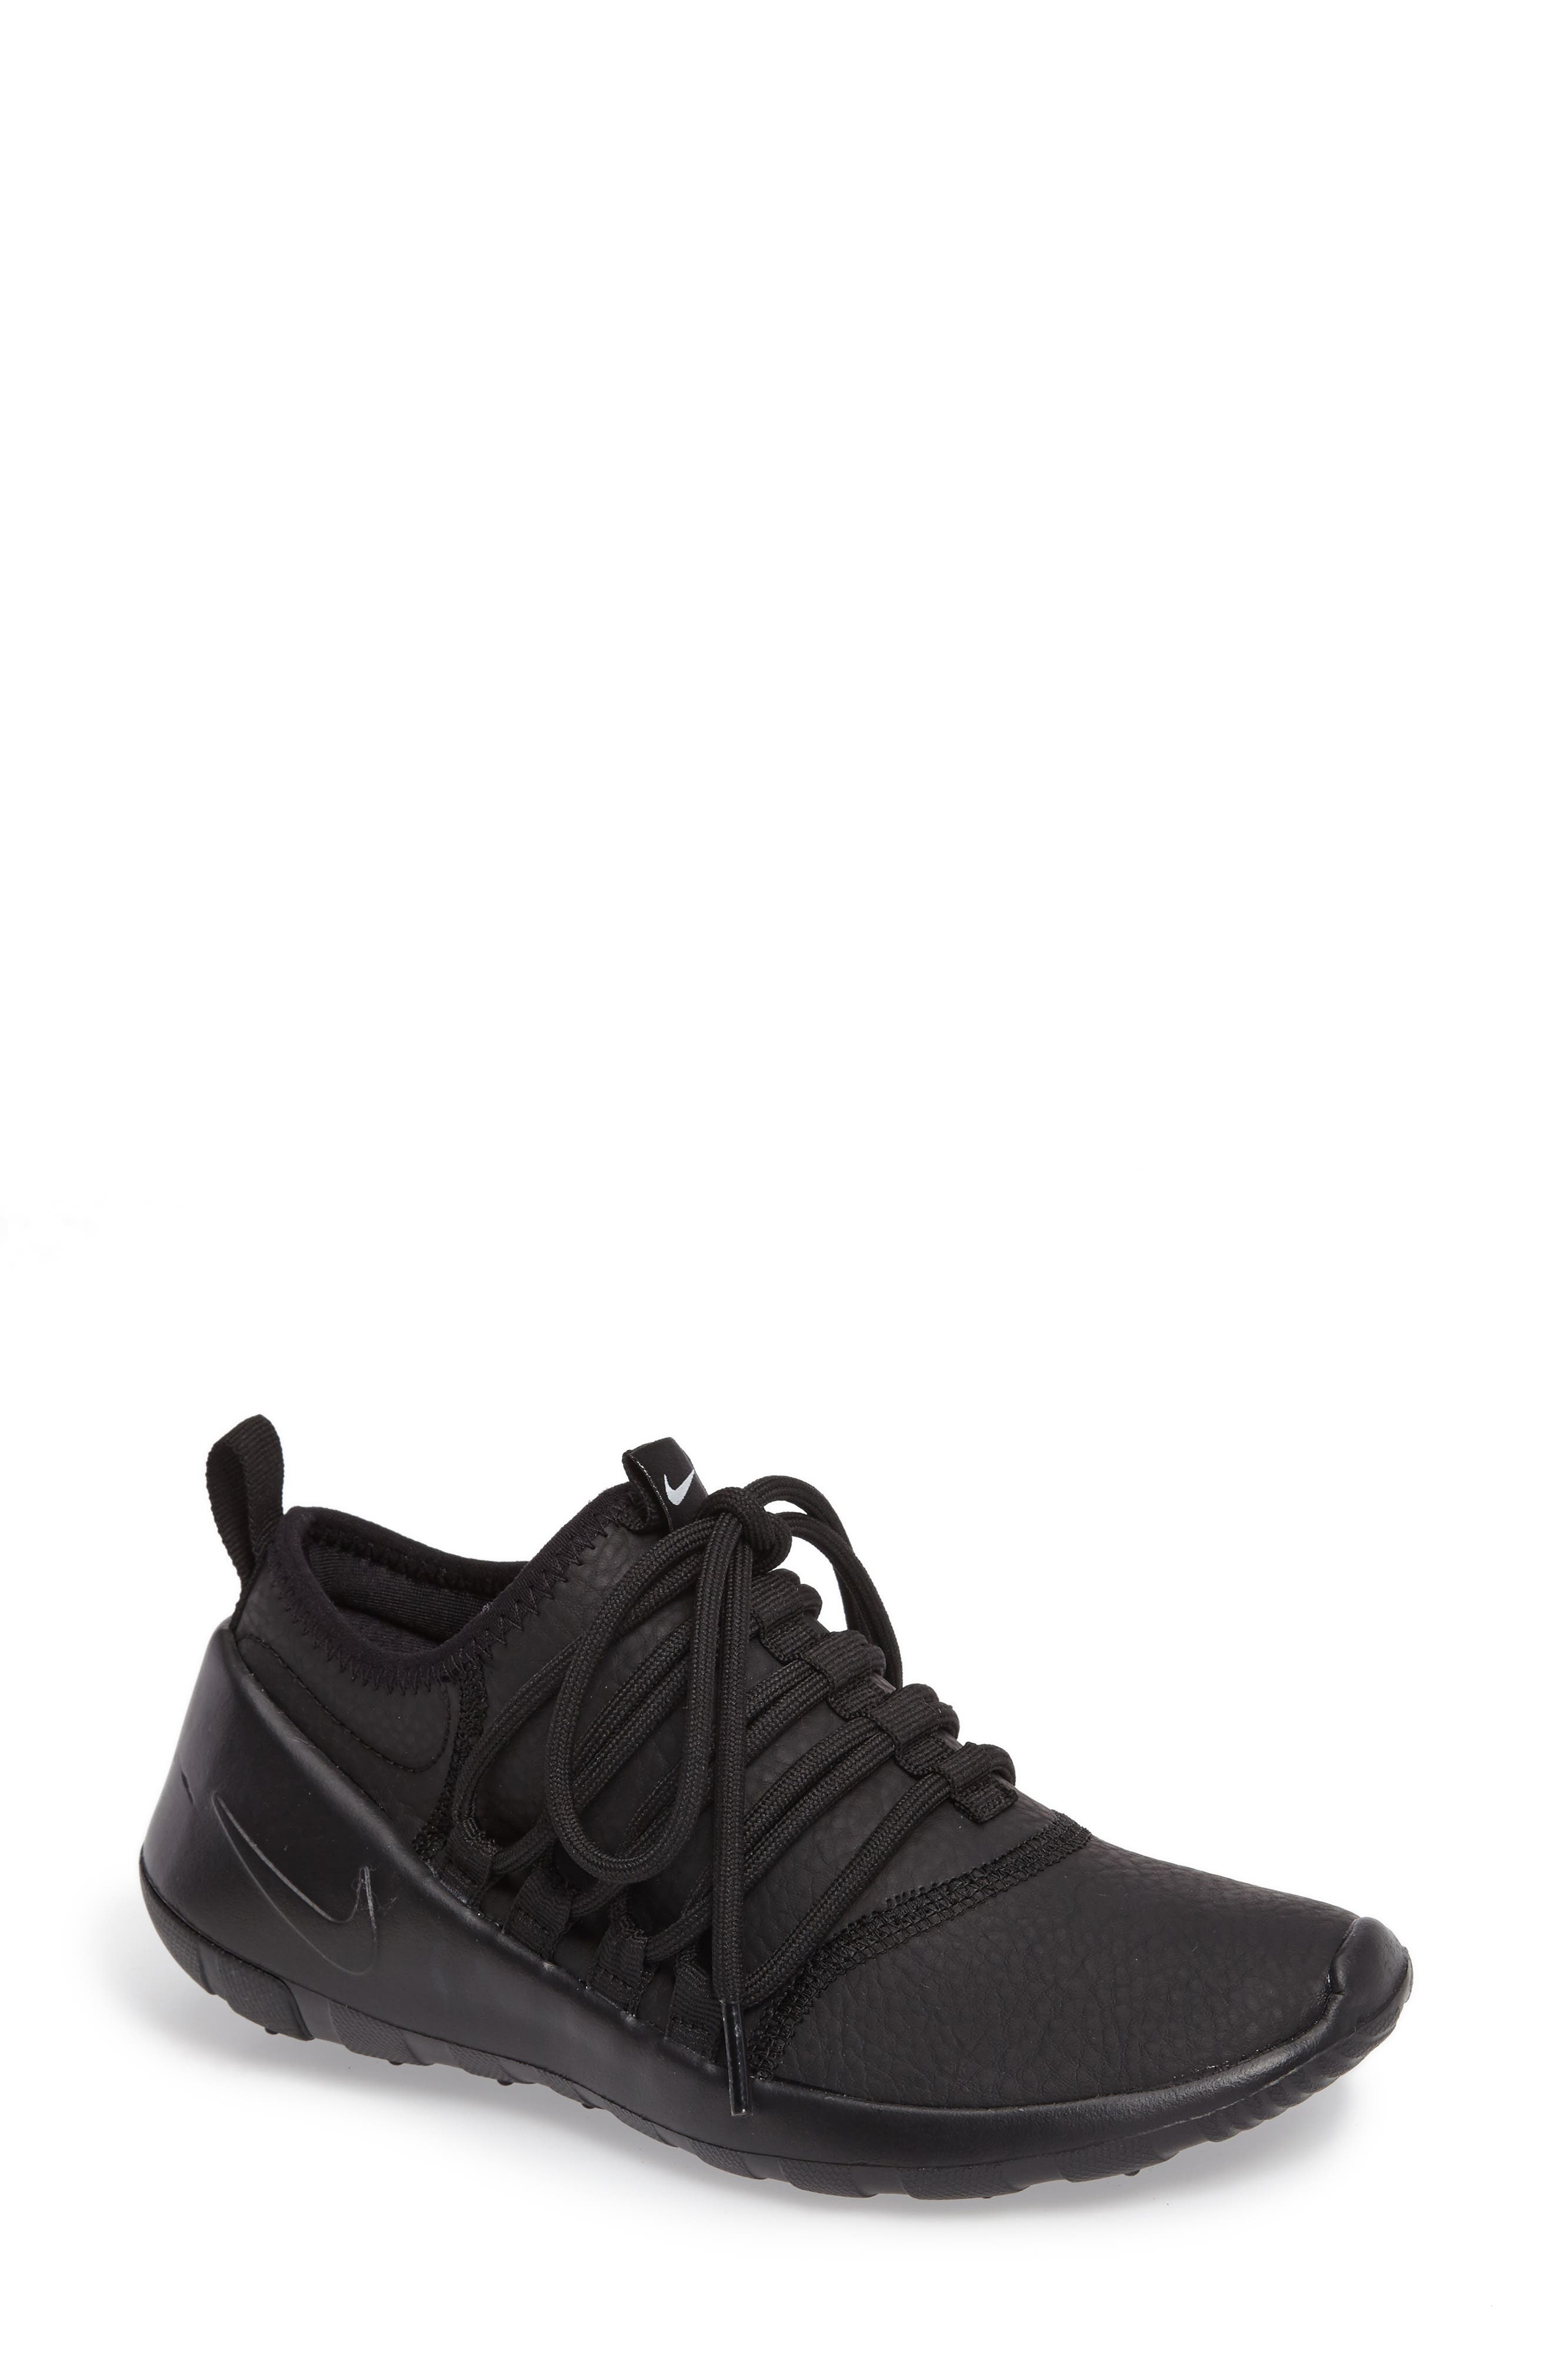 Payaa Premium Sneaker,                         Main,                         color, 001